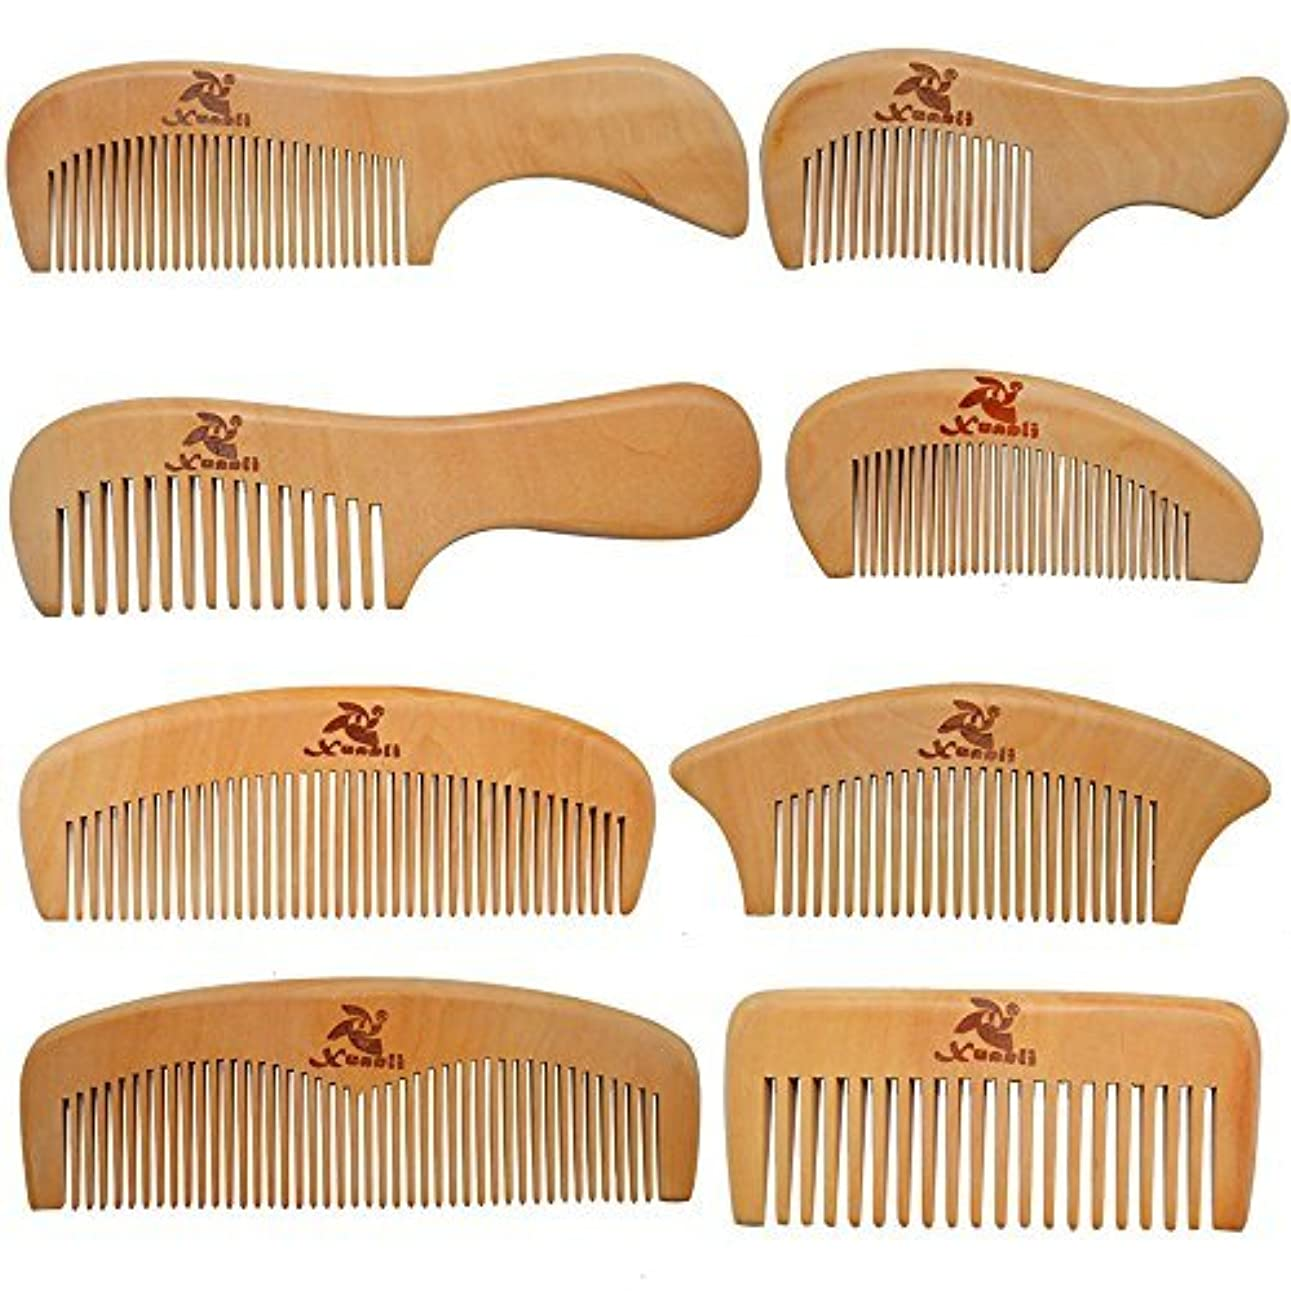 Xuanli 8 Pcs The Family Of Hair Comb set - Wood with Anti-Static & No Snag Handmade Brush for Beard, Head Hair...